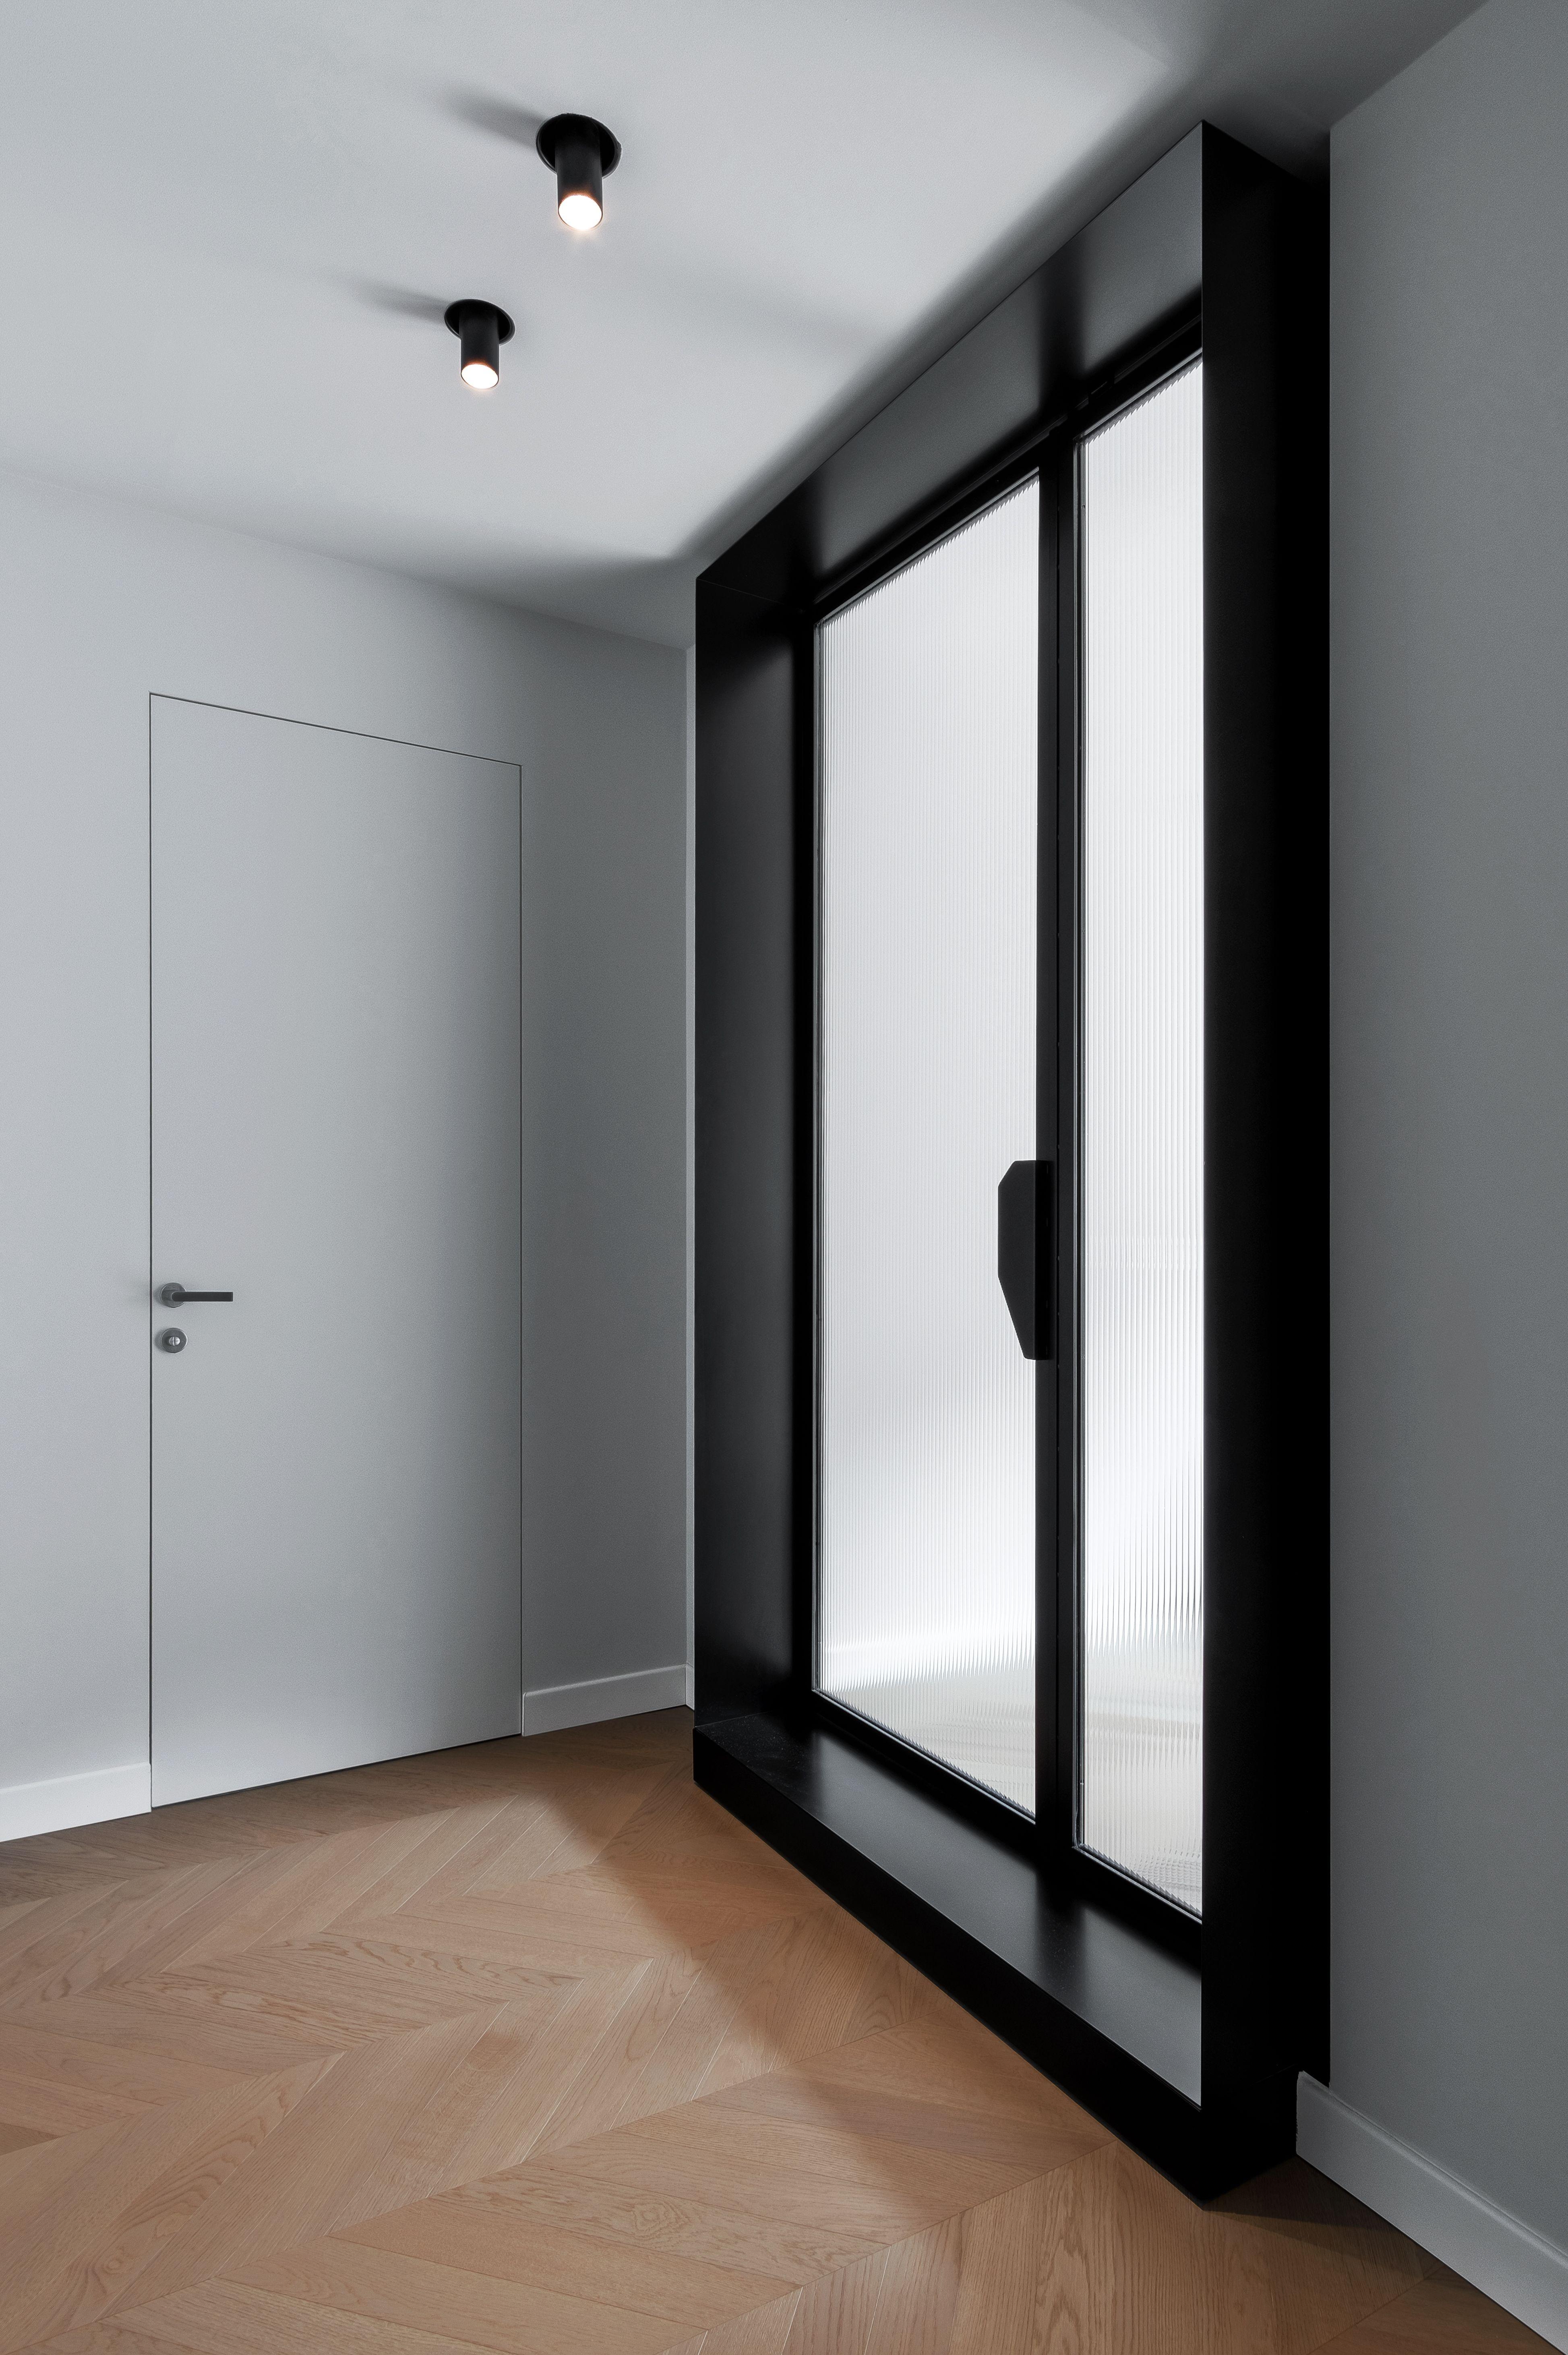 #house #interiordesign #luxuryhouse #interior #interiorarchitecture #entryway